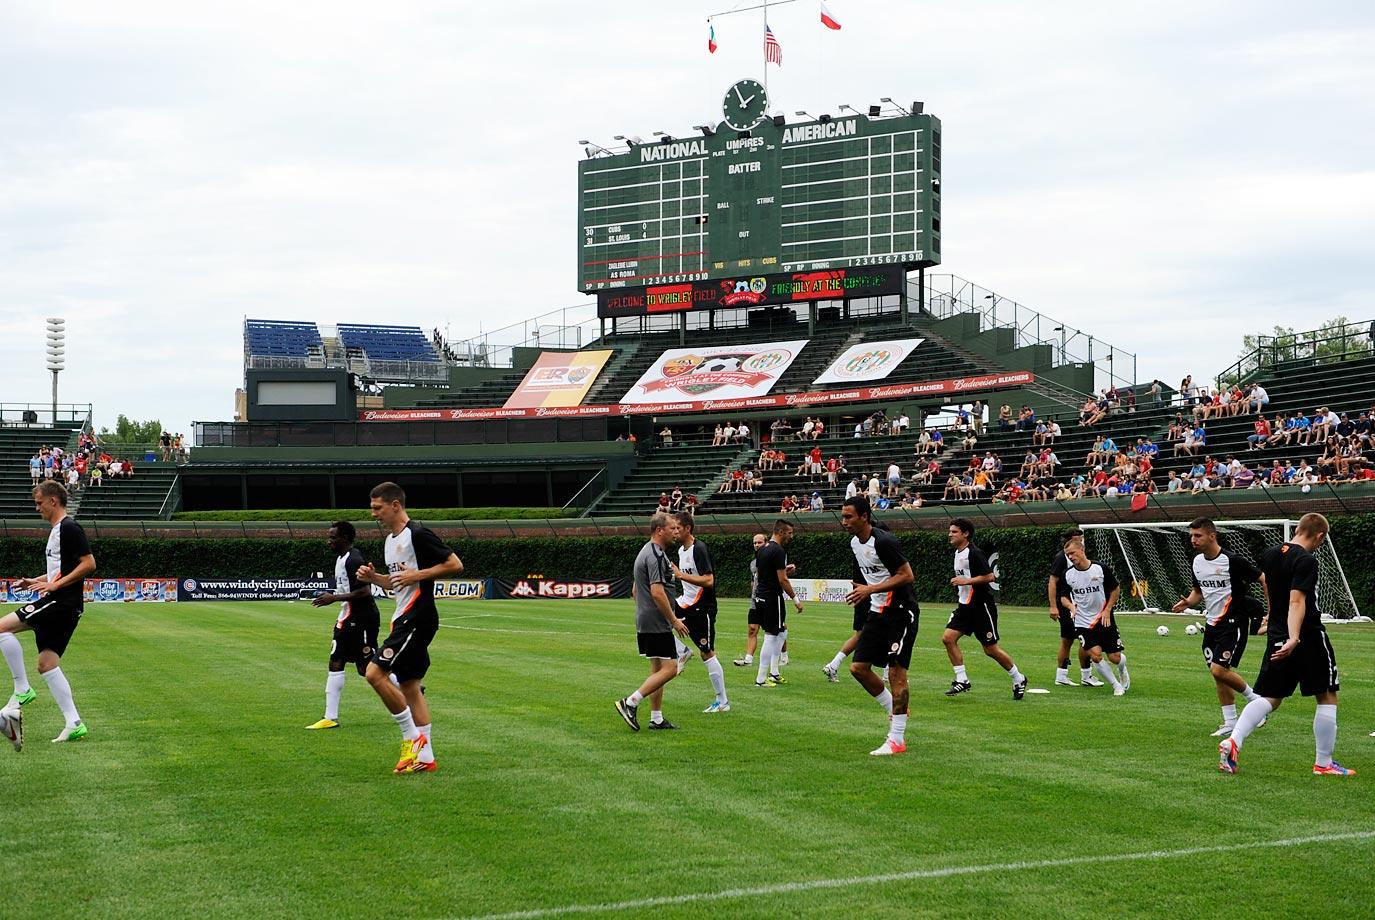 A.C. Roma played Zaglebie Lubin at Wrigley Field on July 22, 1012.